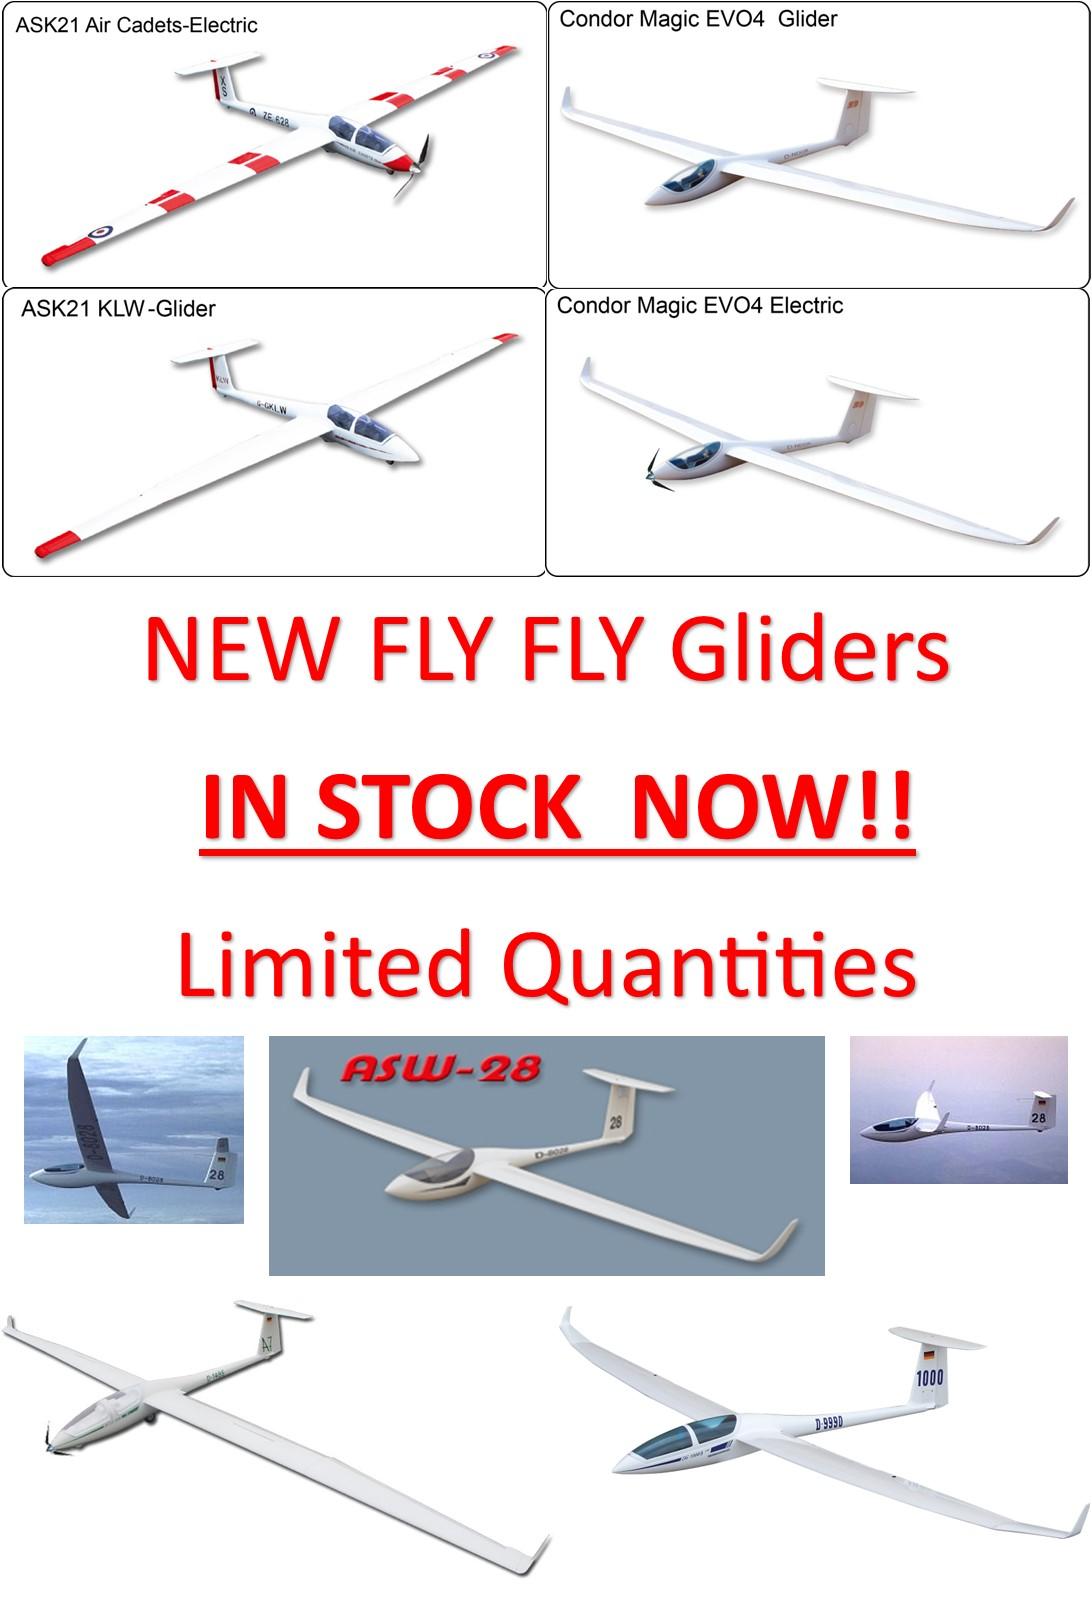 DG1000 Scale glider 2.6m Fibreglass Fuselage/Balsa Wings